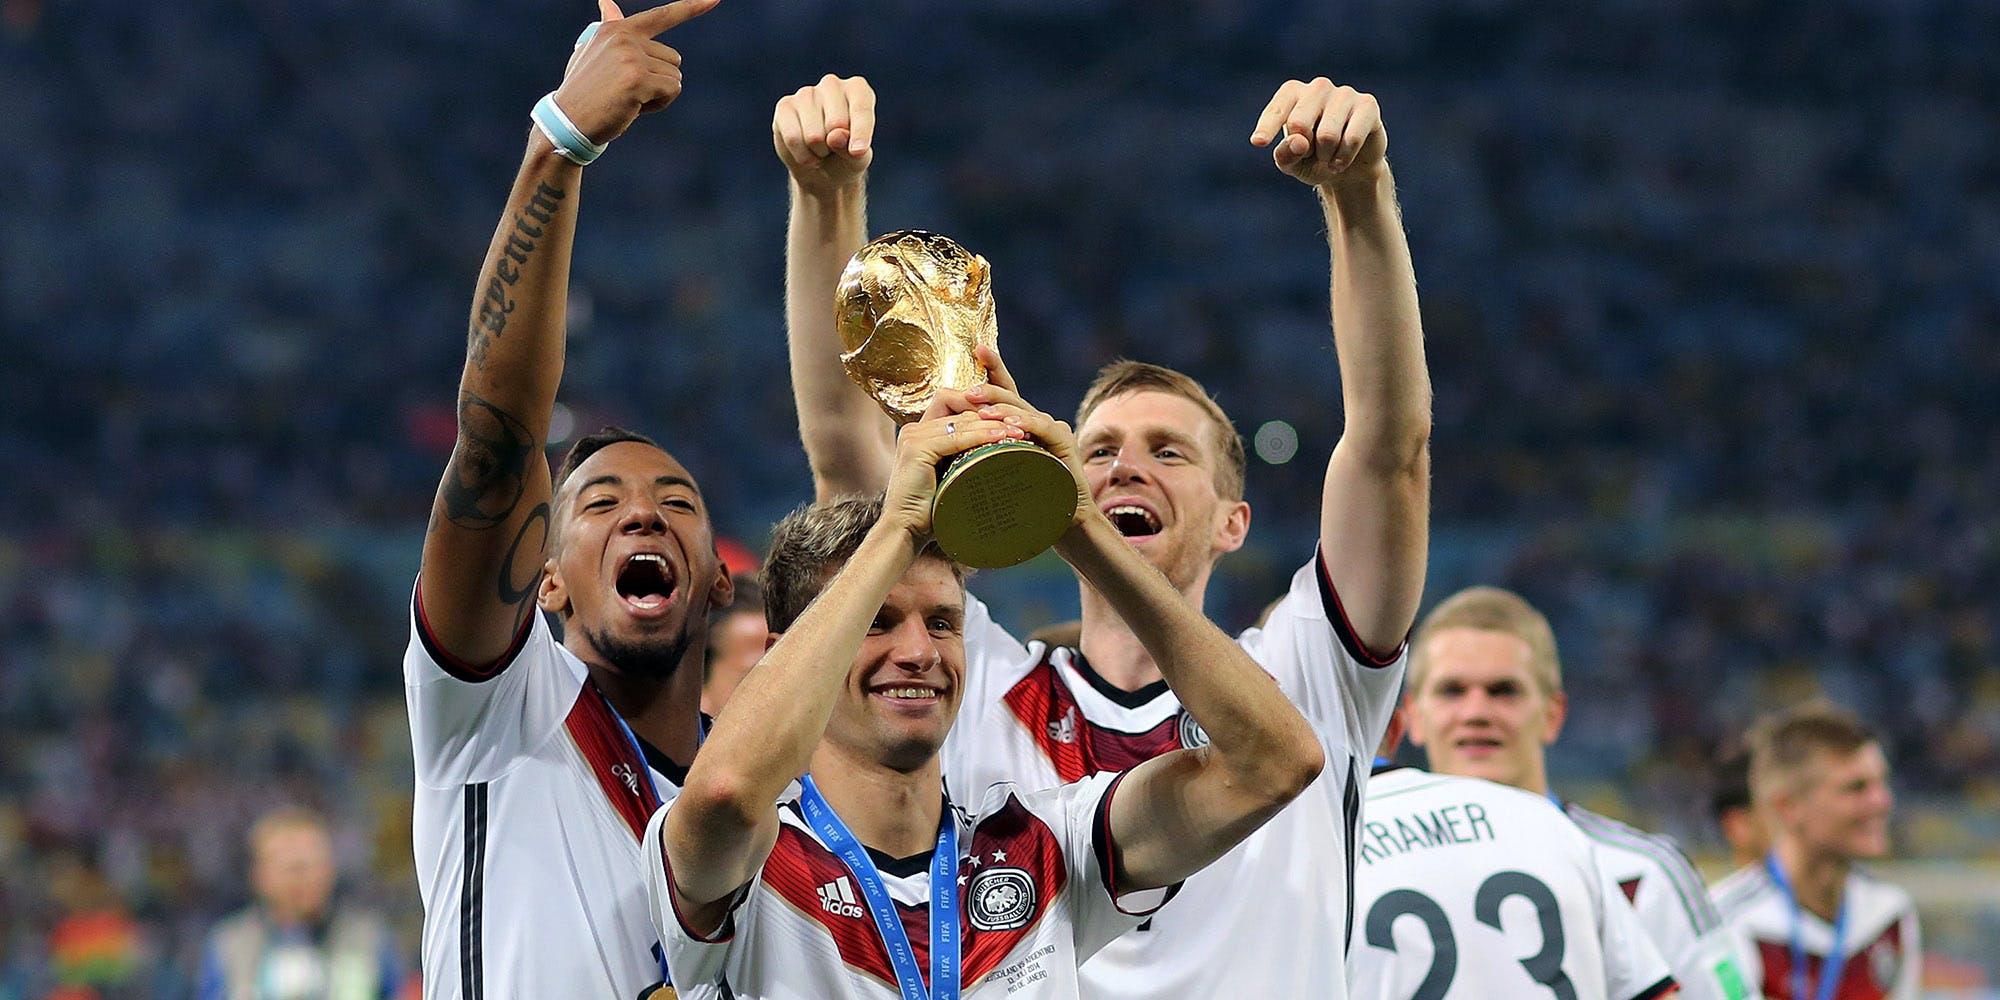 German men's soccer national team stream germany vs ukraine uefa nations league